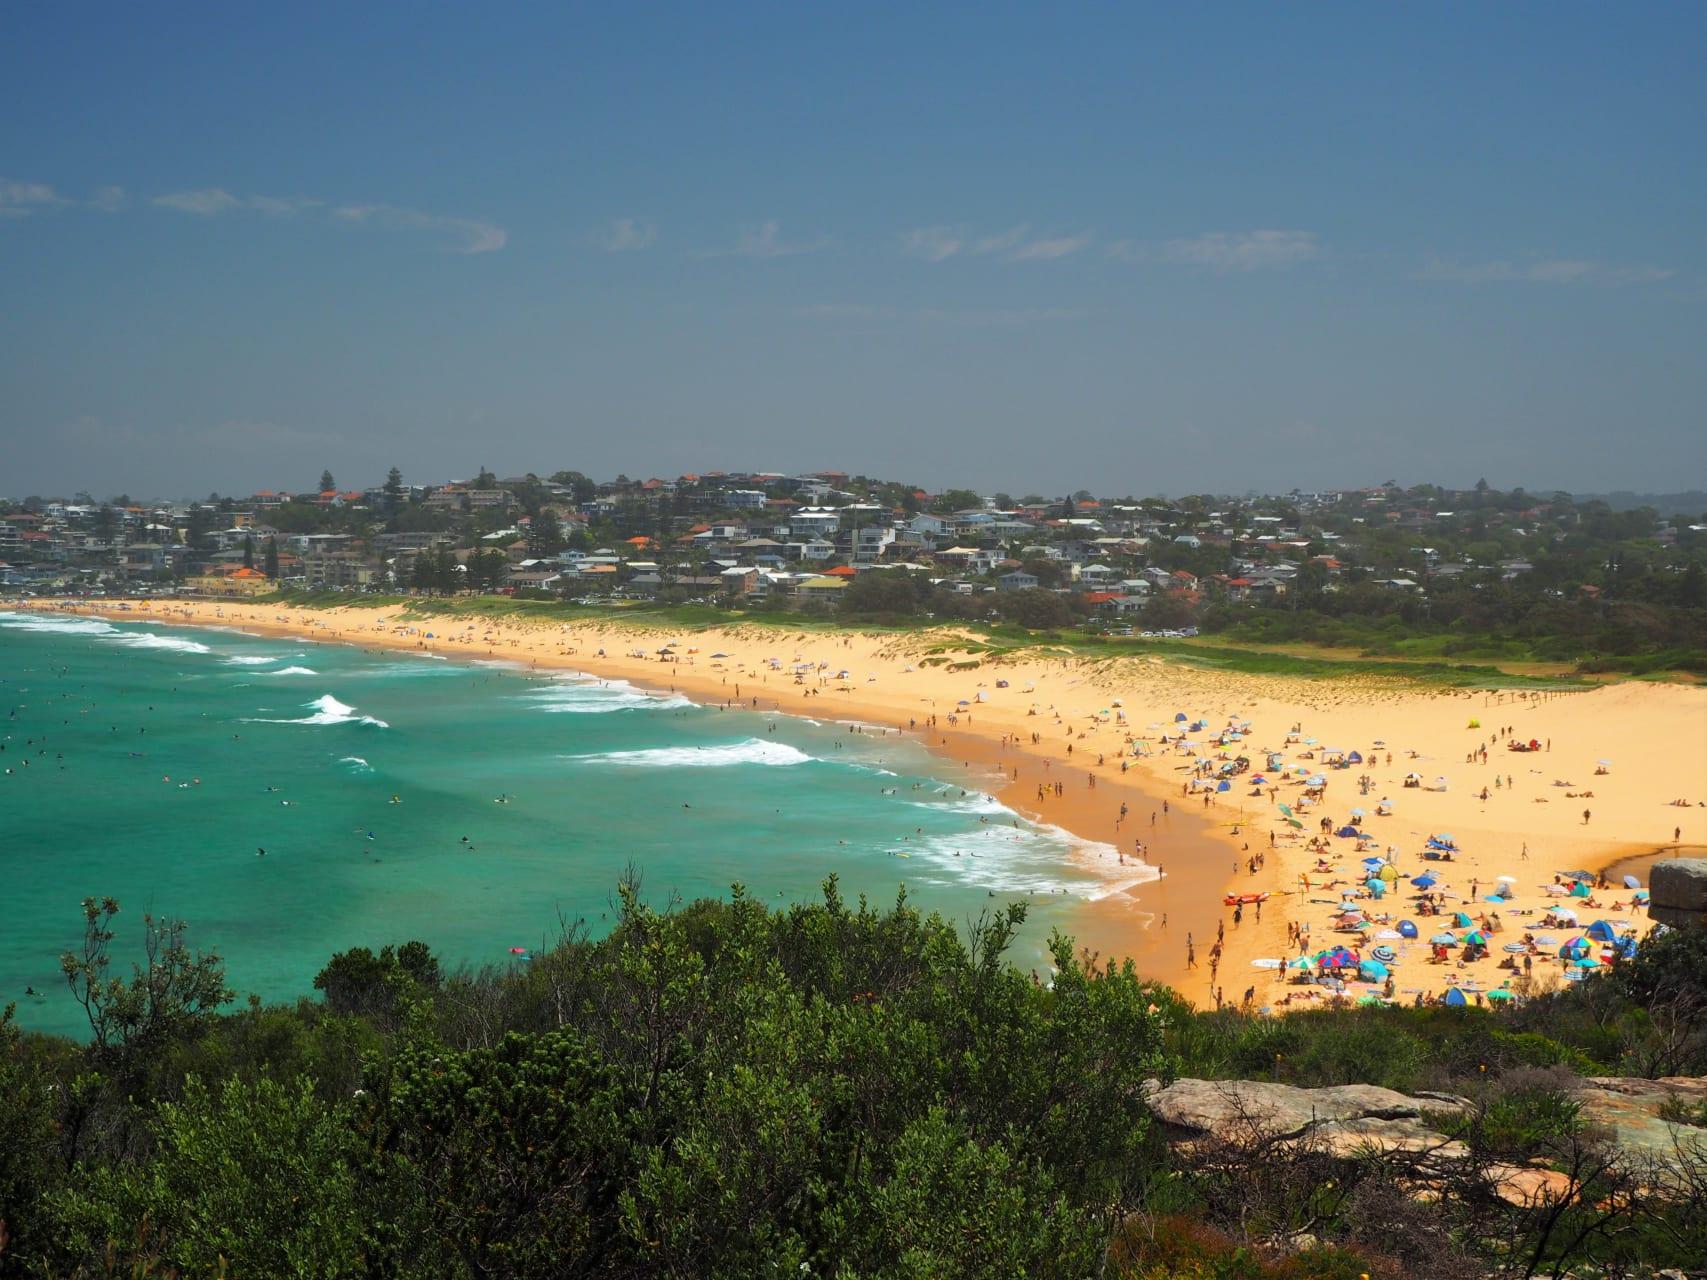 Sydney - A Sydney Beach Walk to Make You Wish You Were Here